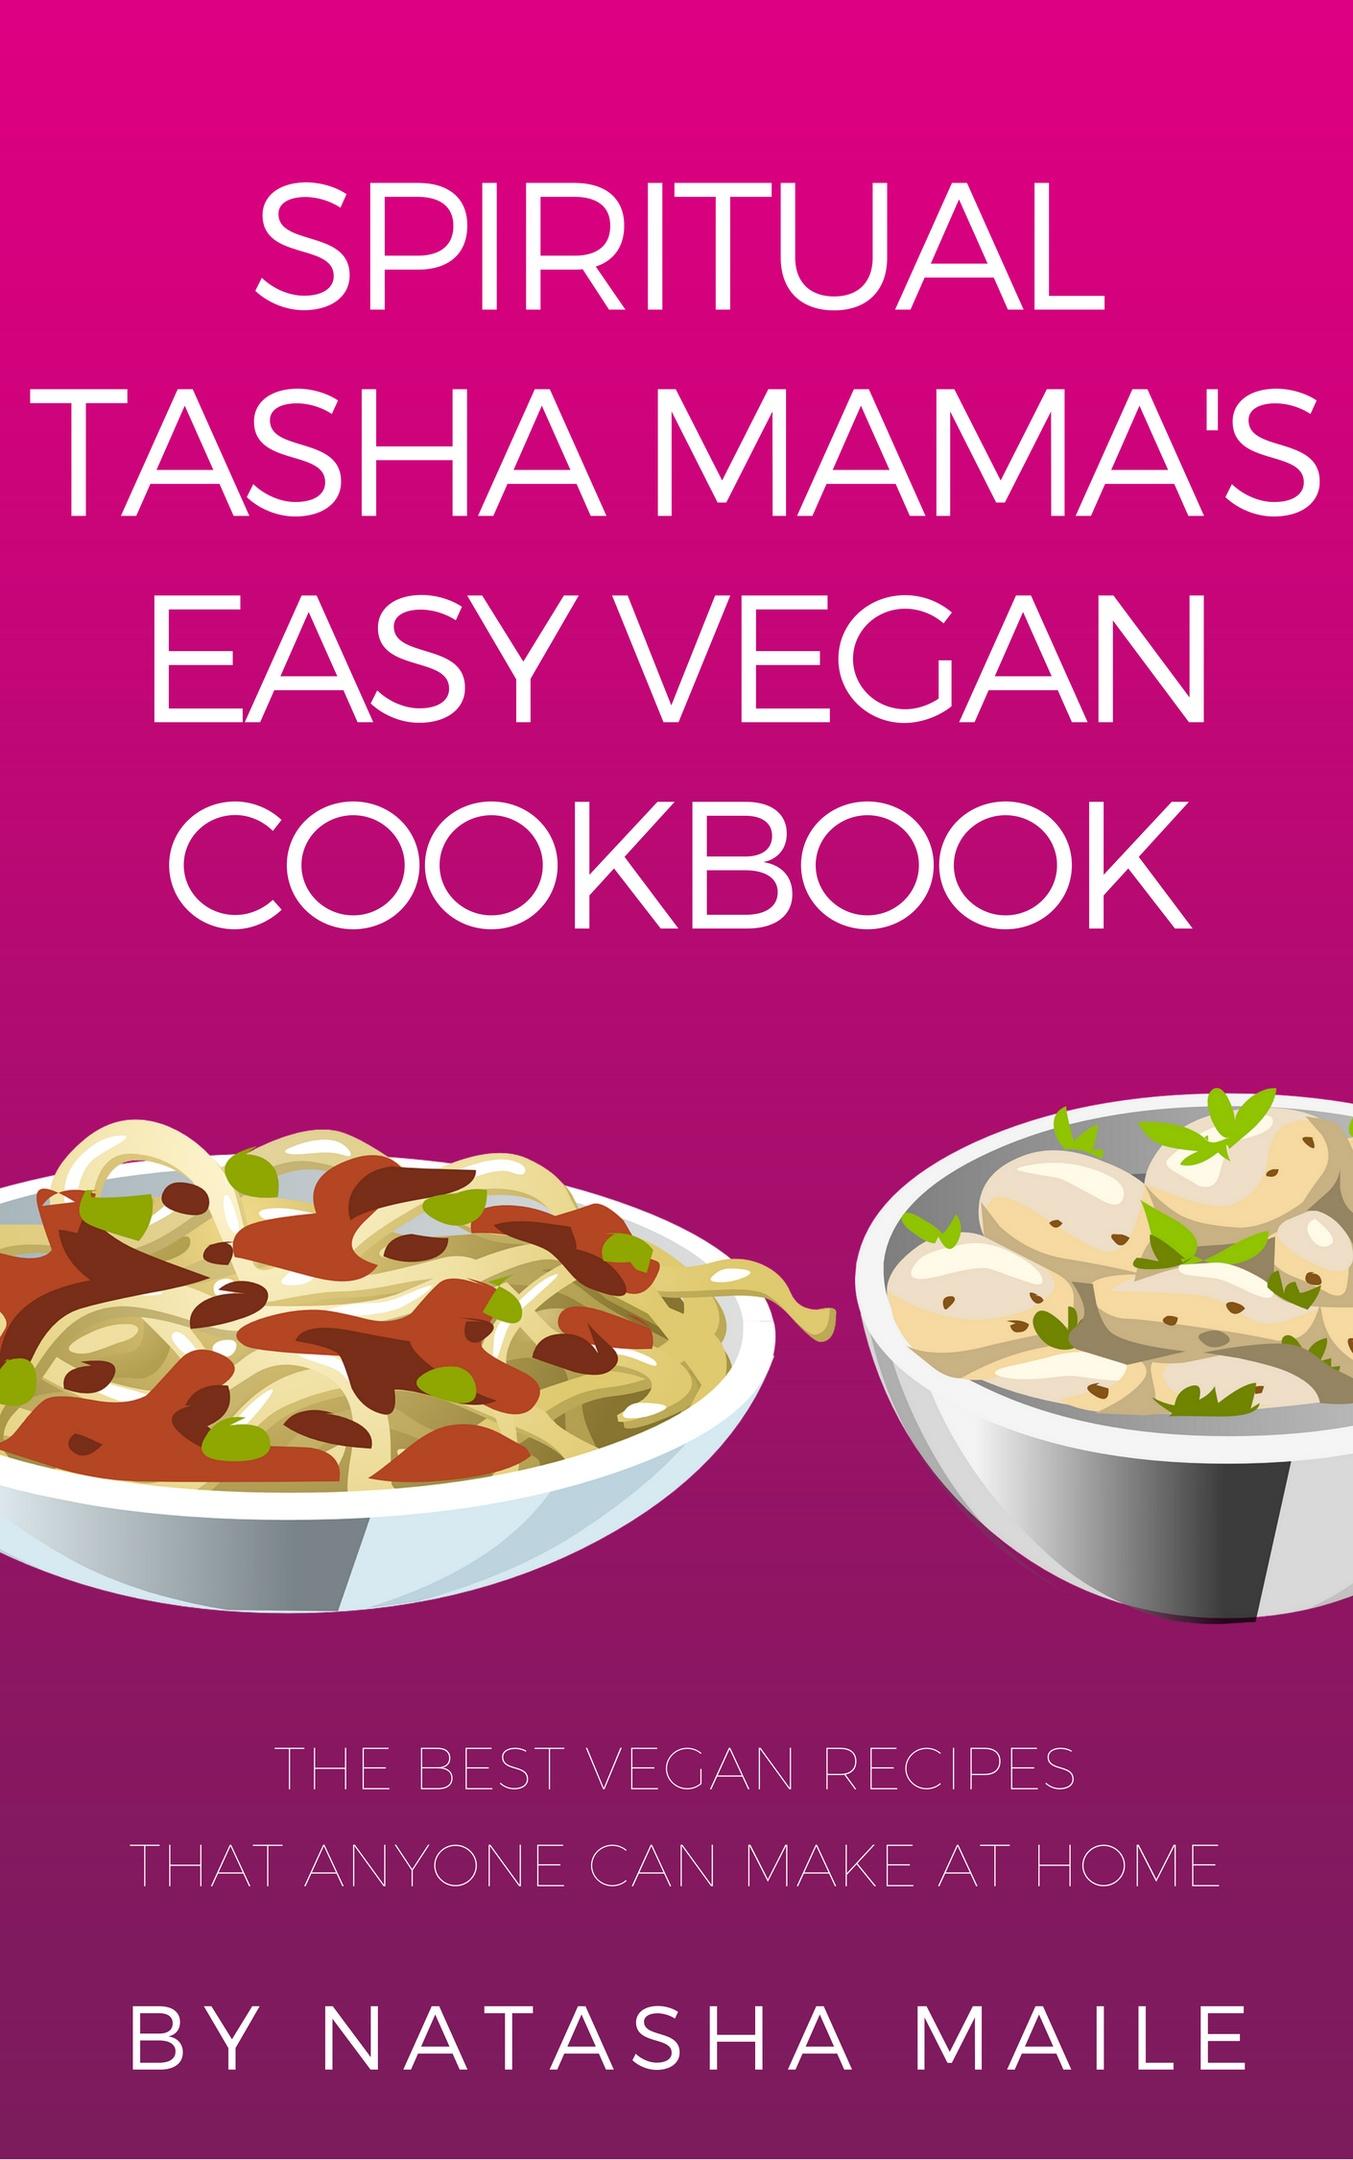 Easy Vegan Cookbook by Natasha Maile